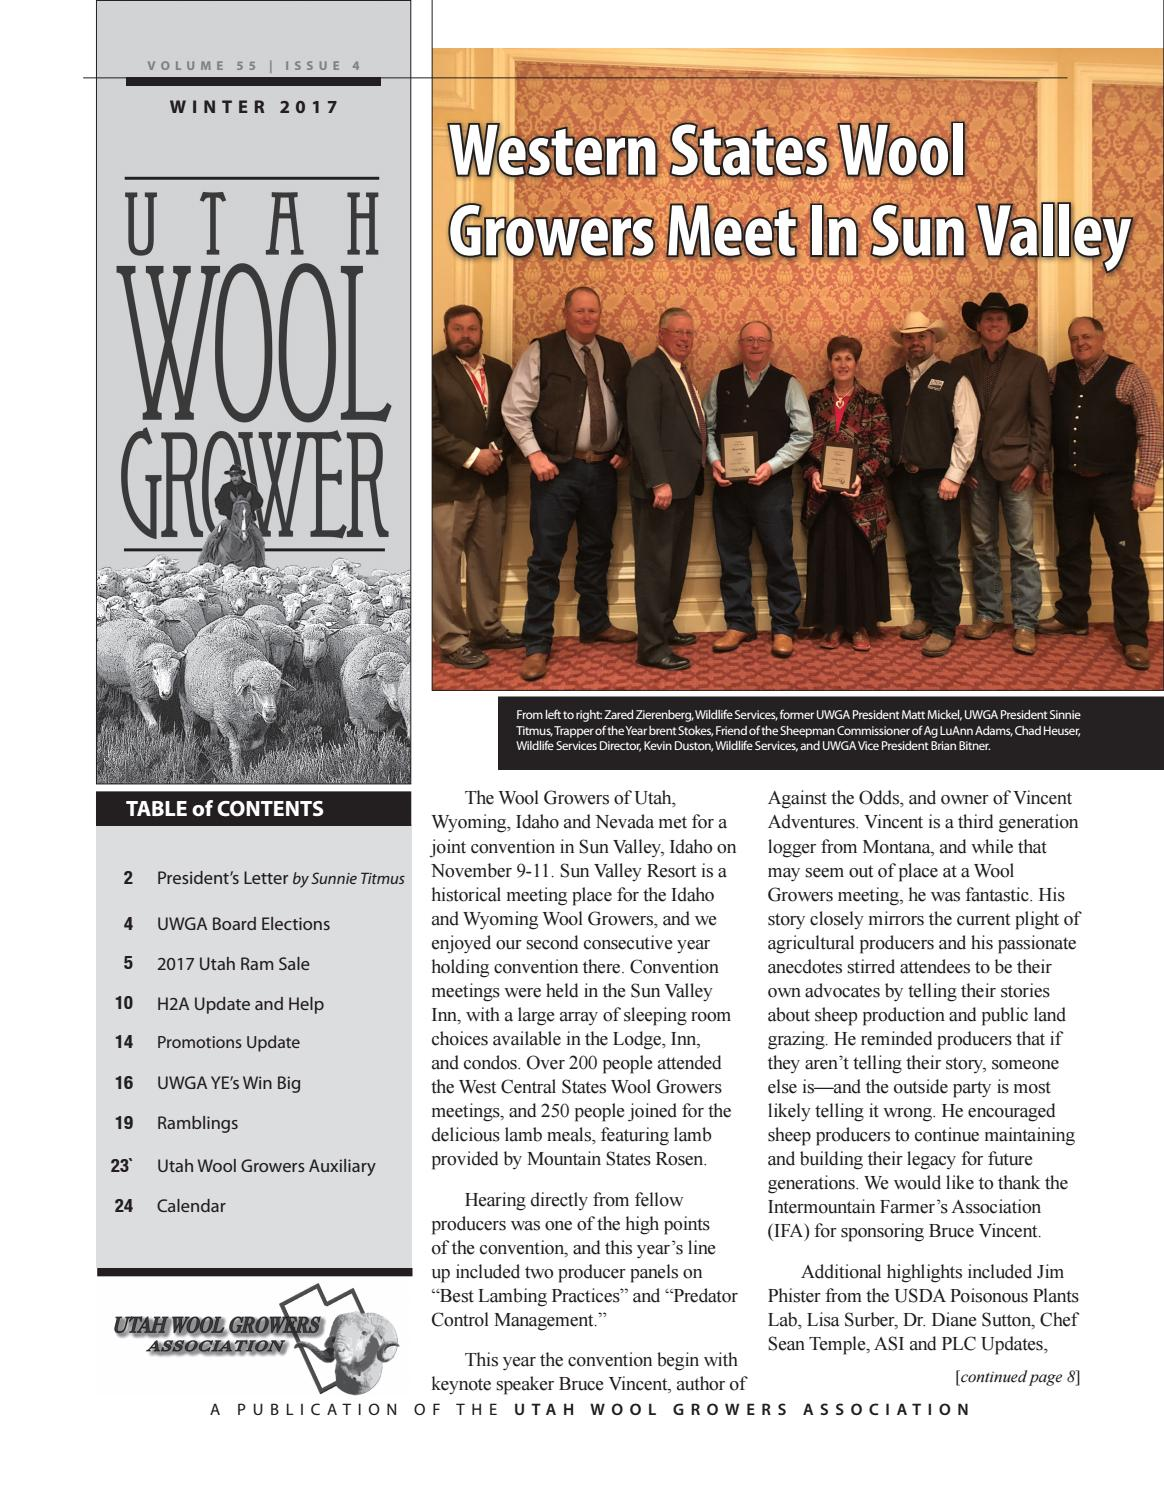 d27b74c32e8 UWGA Winter2017 newsletter by Utah Wool Growers Association - issuu